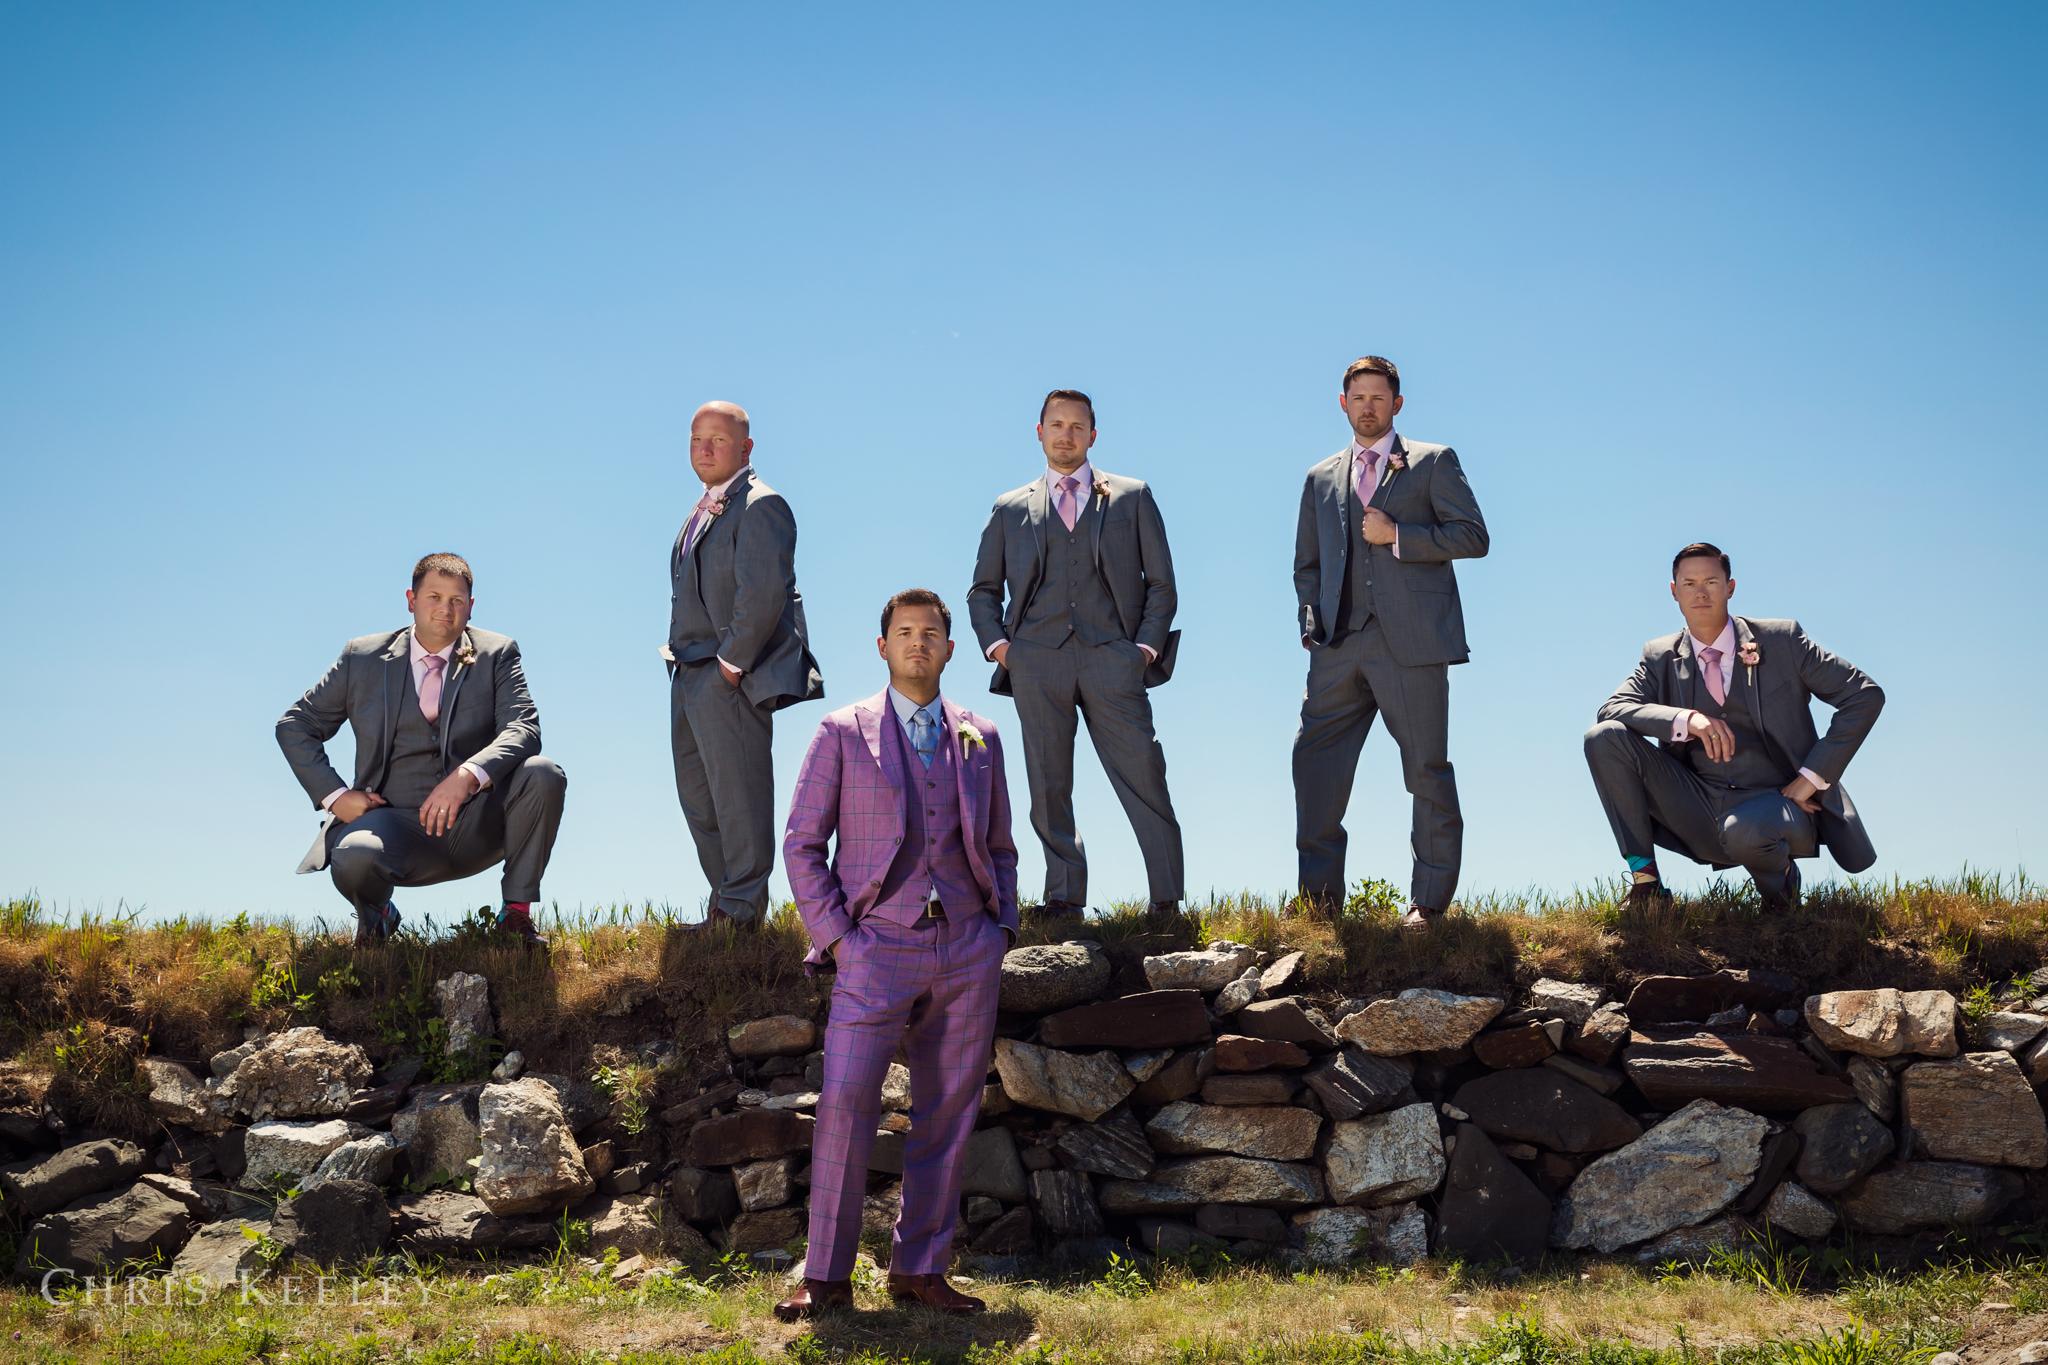 wentworth-portsmouth-new-hampshire-wedding-photographer-45.jpg